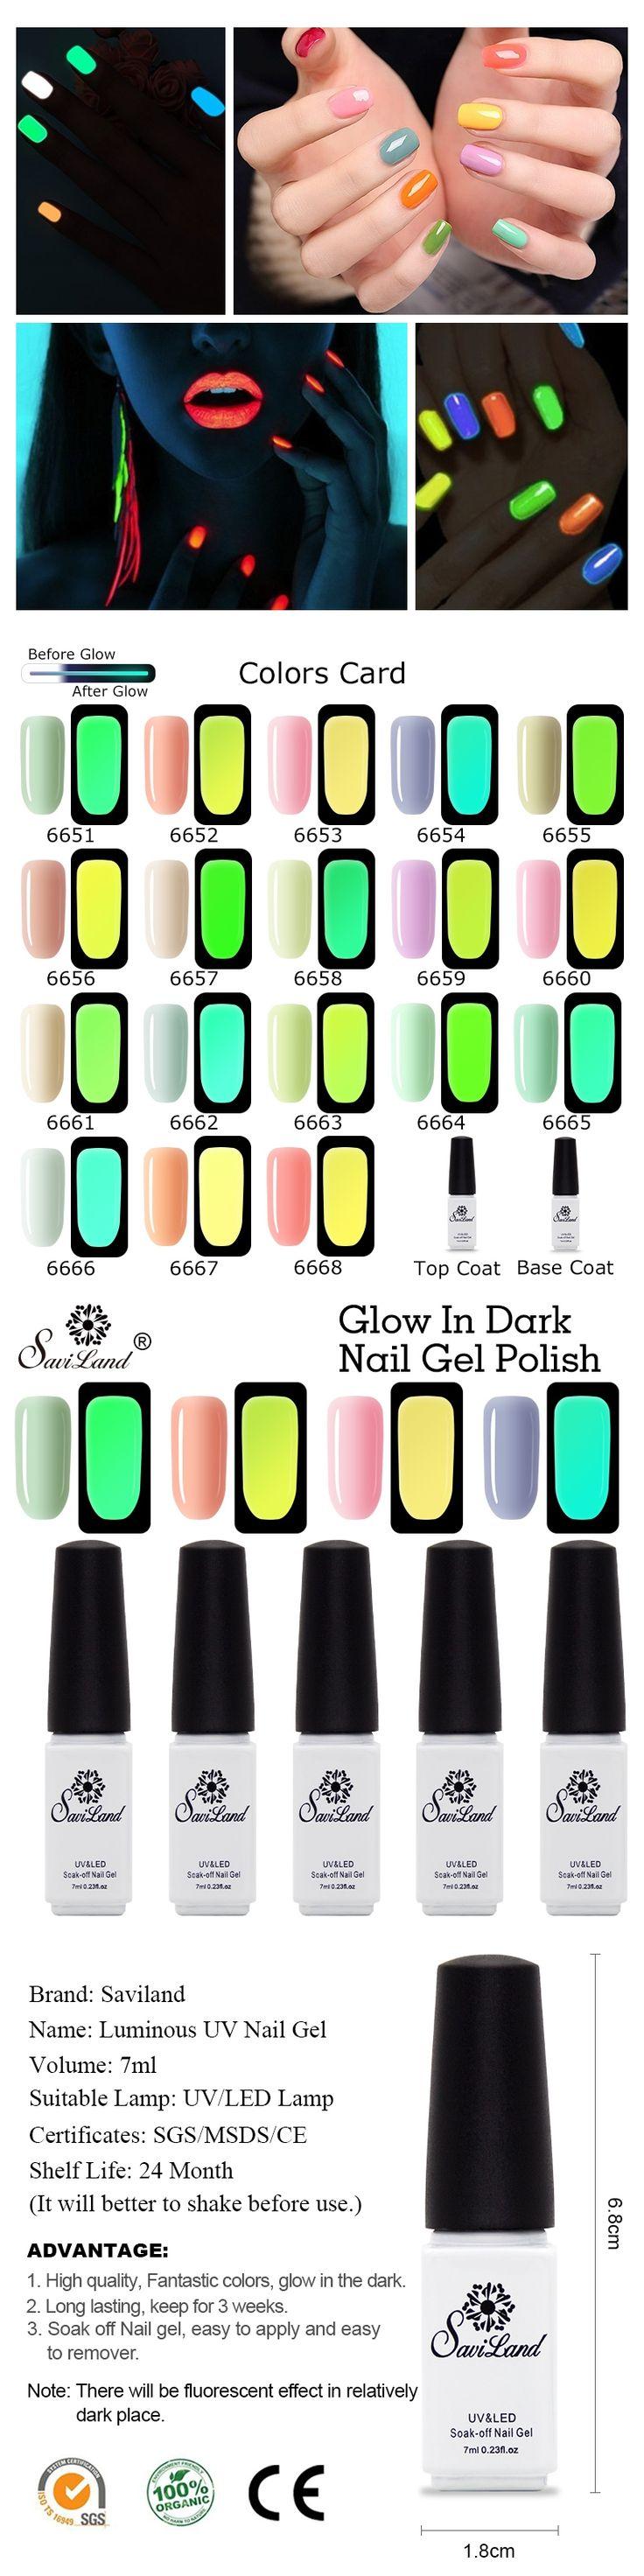 Saviland The Dark Luminous Fluorescent Nail Art Polish Soak Off UV/LED Gel Night Glow In Dark Lacquer Manicure Tools